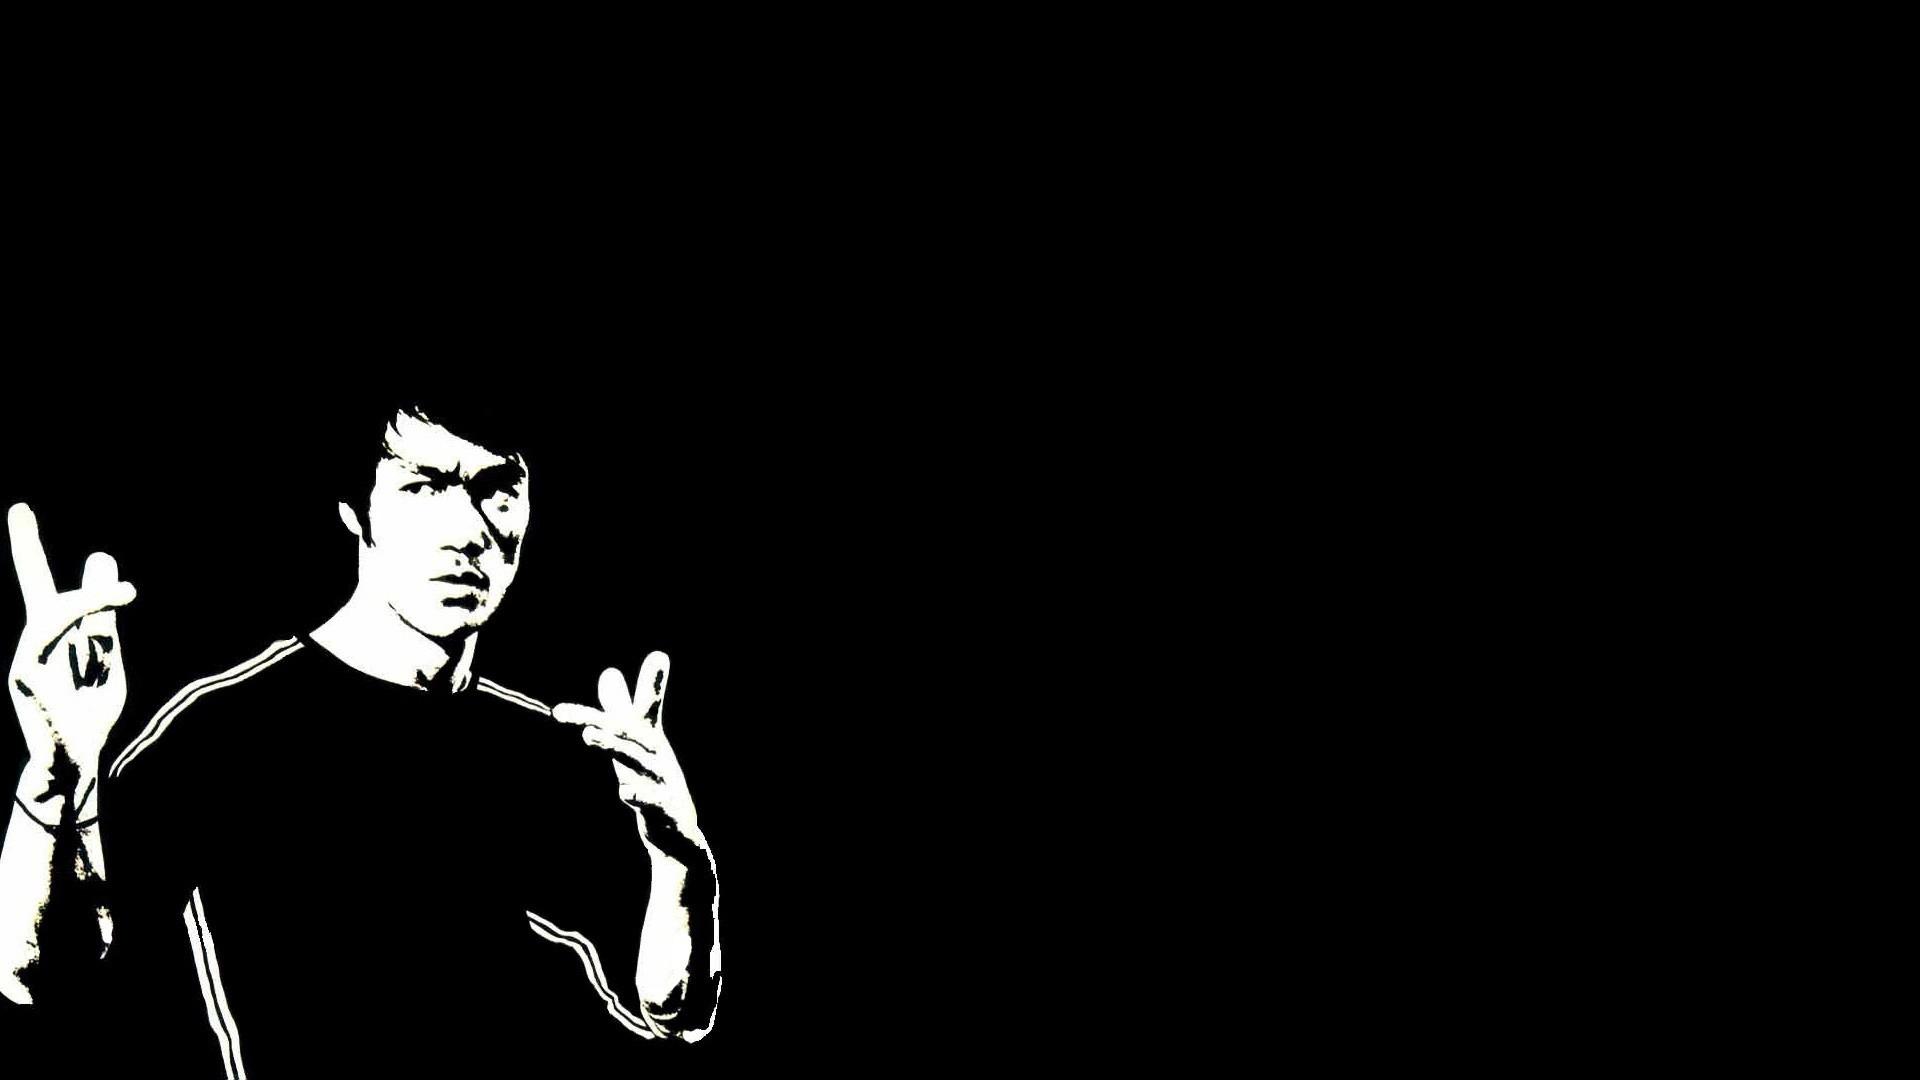 Bruce Lee WhatsApp DP Images 1920×1080 Bruce Lee Wallpaper (49 Wallpapers) |